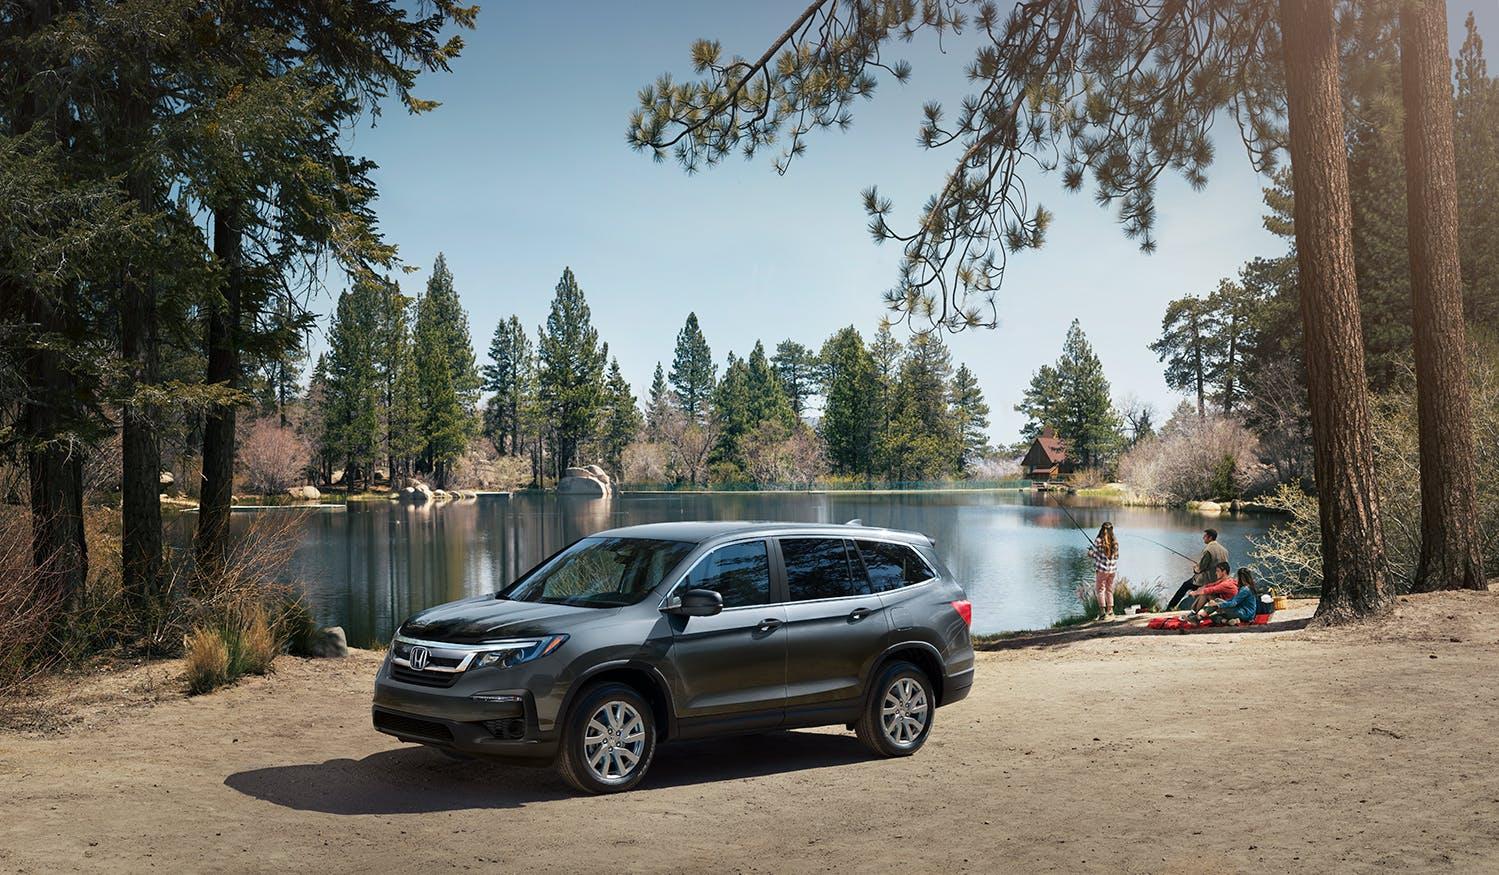 Washington Honda is a Honda Dealership in Washington near Waynesburg PA | 2021 Honda Pilot parked by the lake